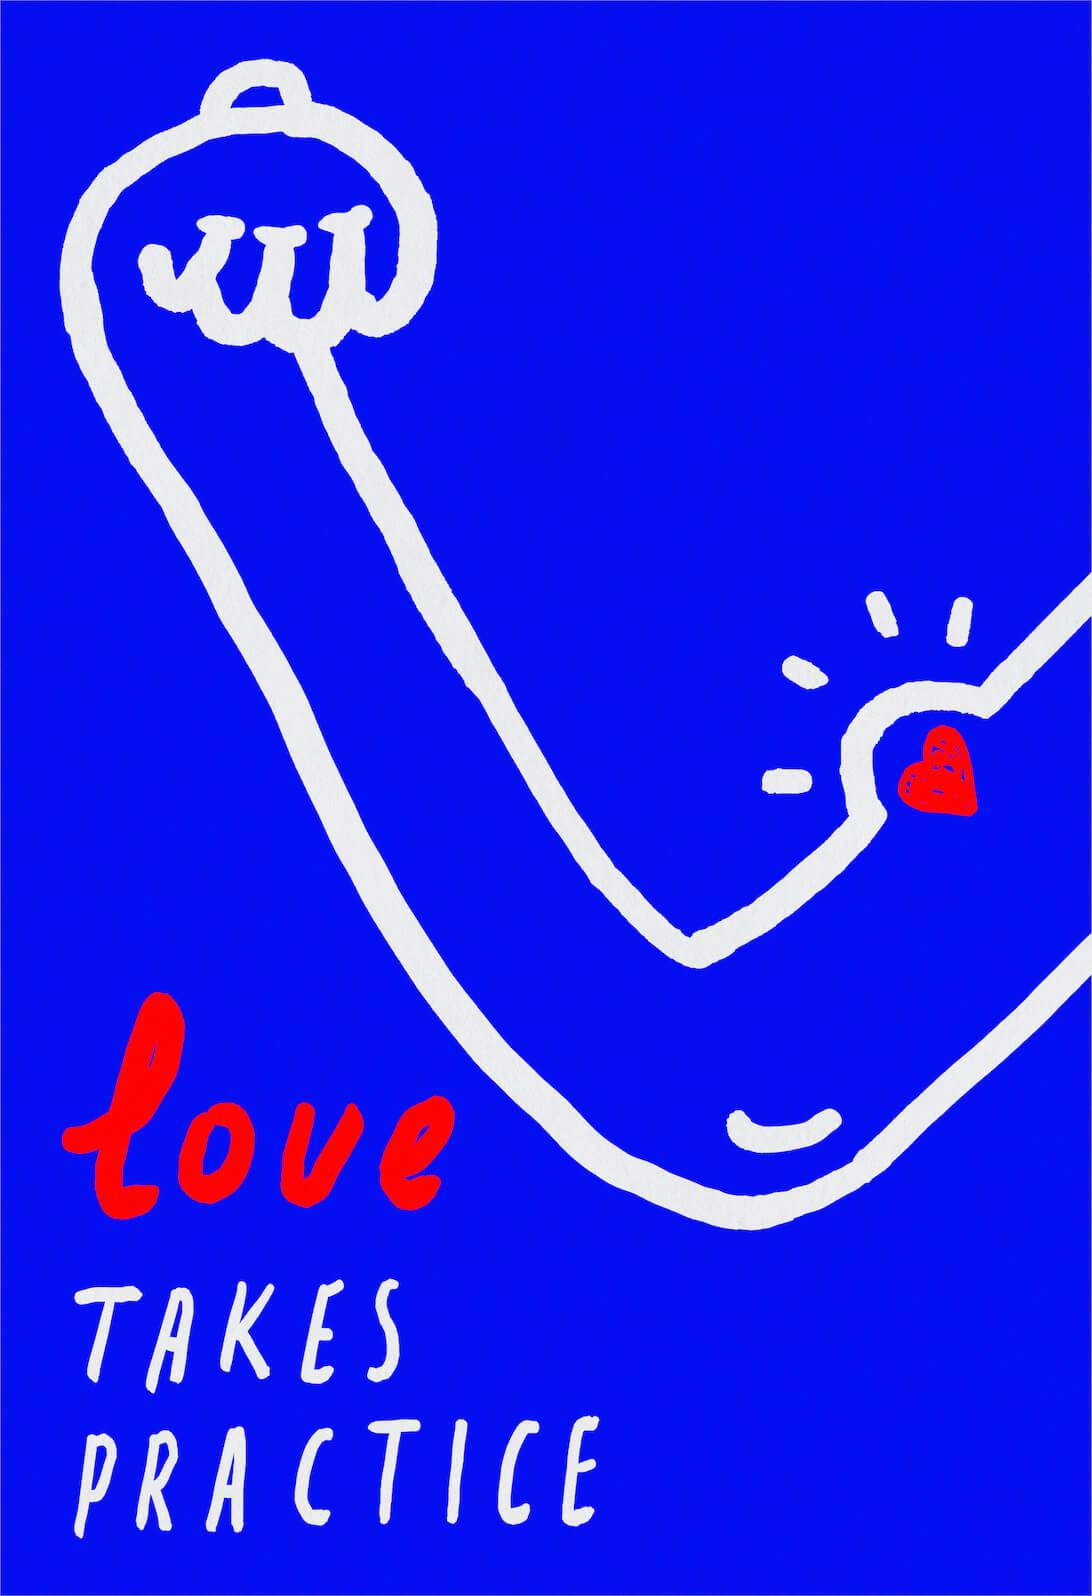 Love Takes Practice main image